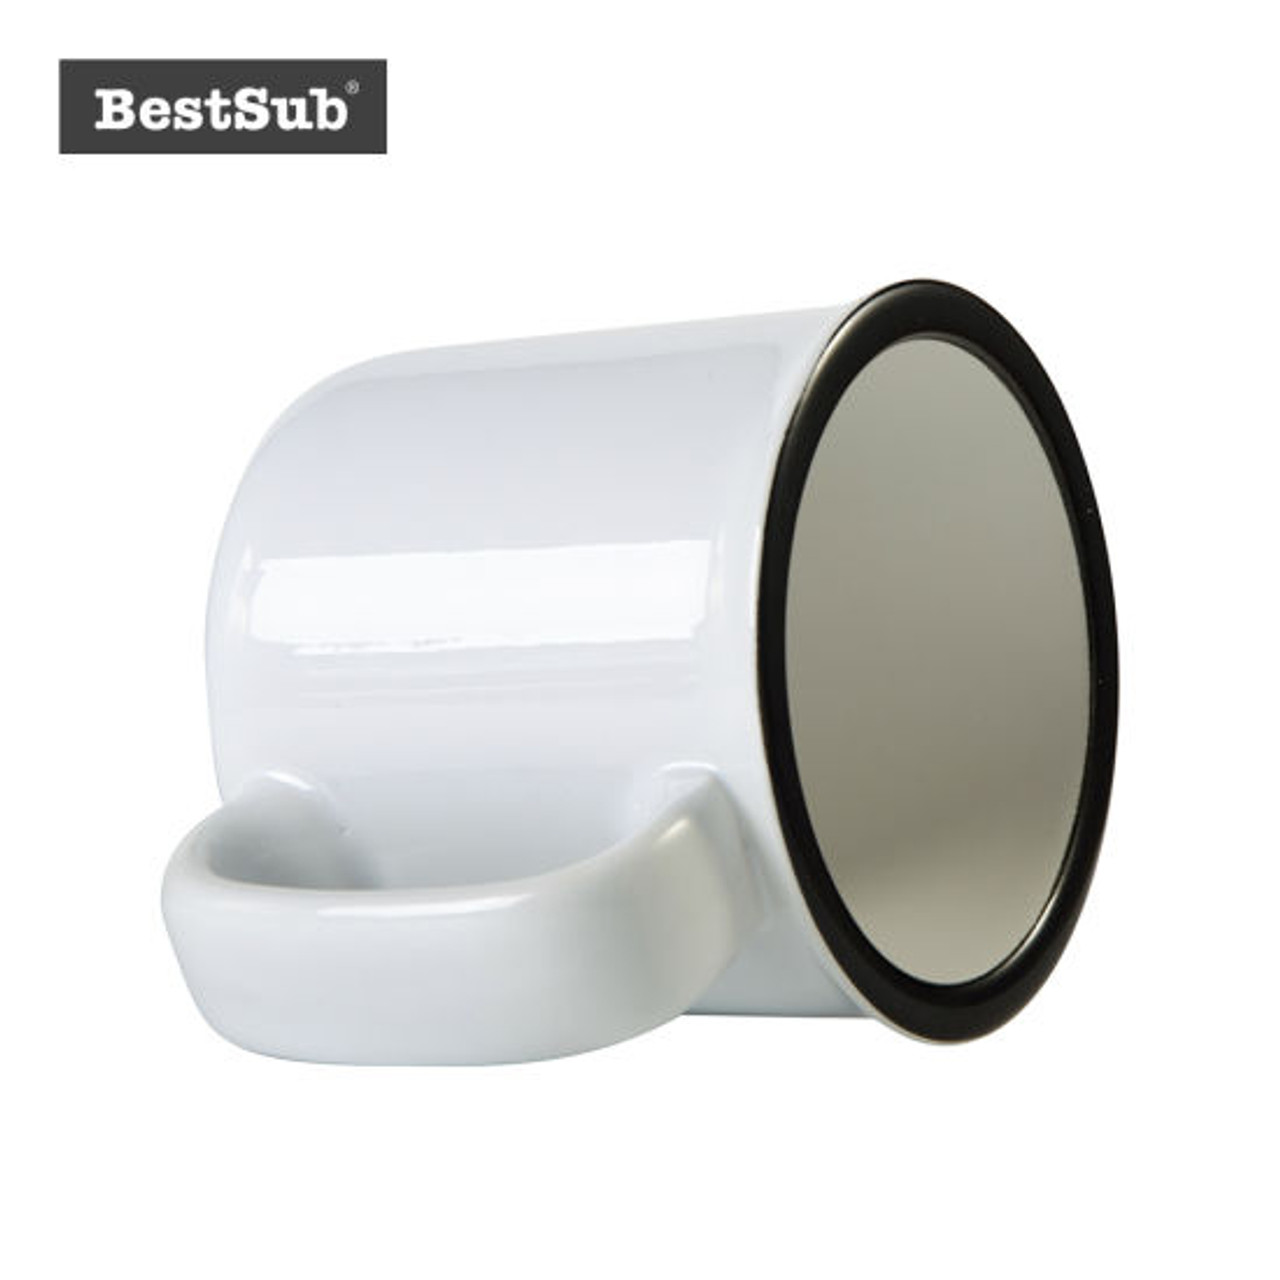 13oz/400ml Ceramic Enamel Mug (White) **WHILE SUPPLIES LAST**